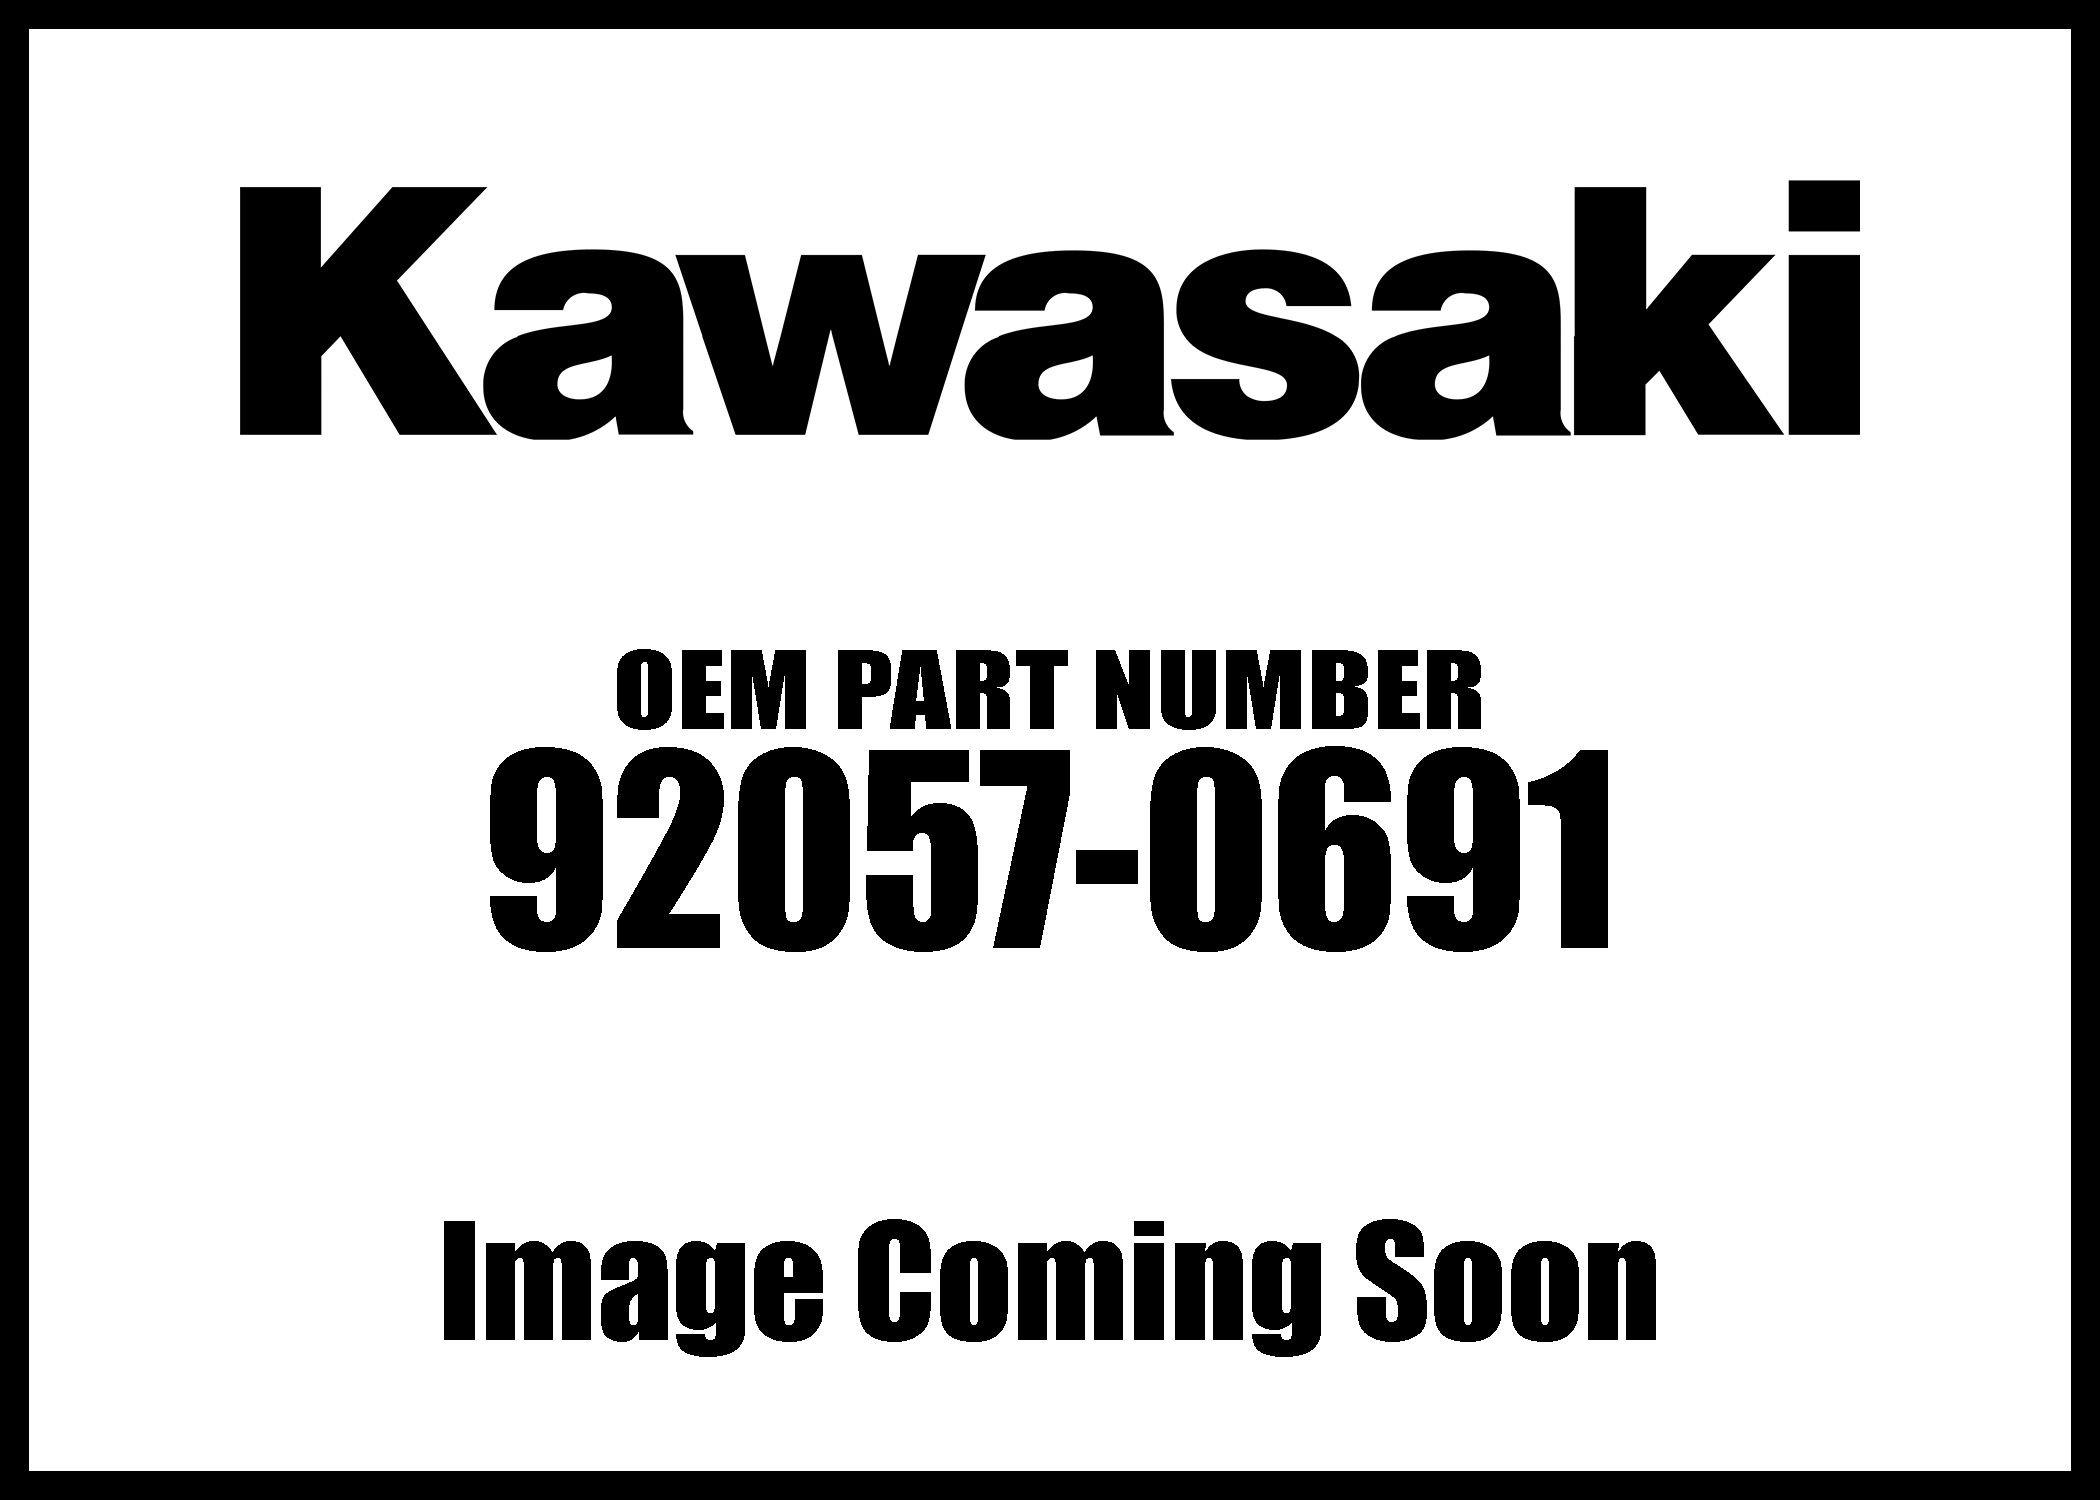 Kawasaki 2002-2018 Kaze-R Other Marketing Names Cam Chain 92057-0691 New Oem